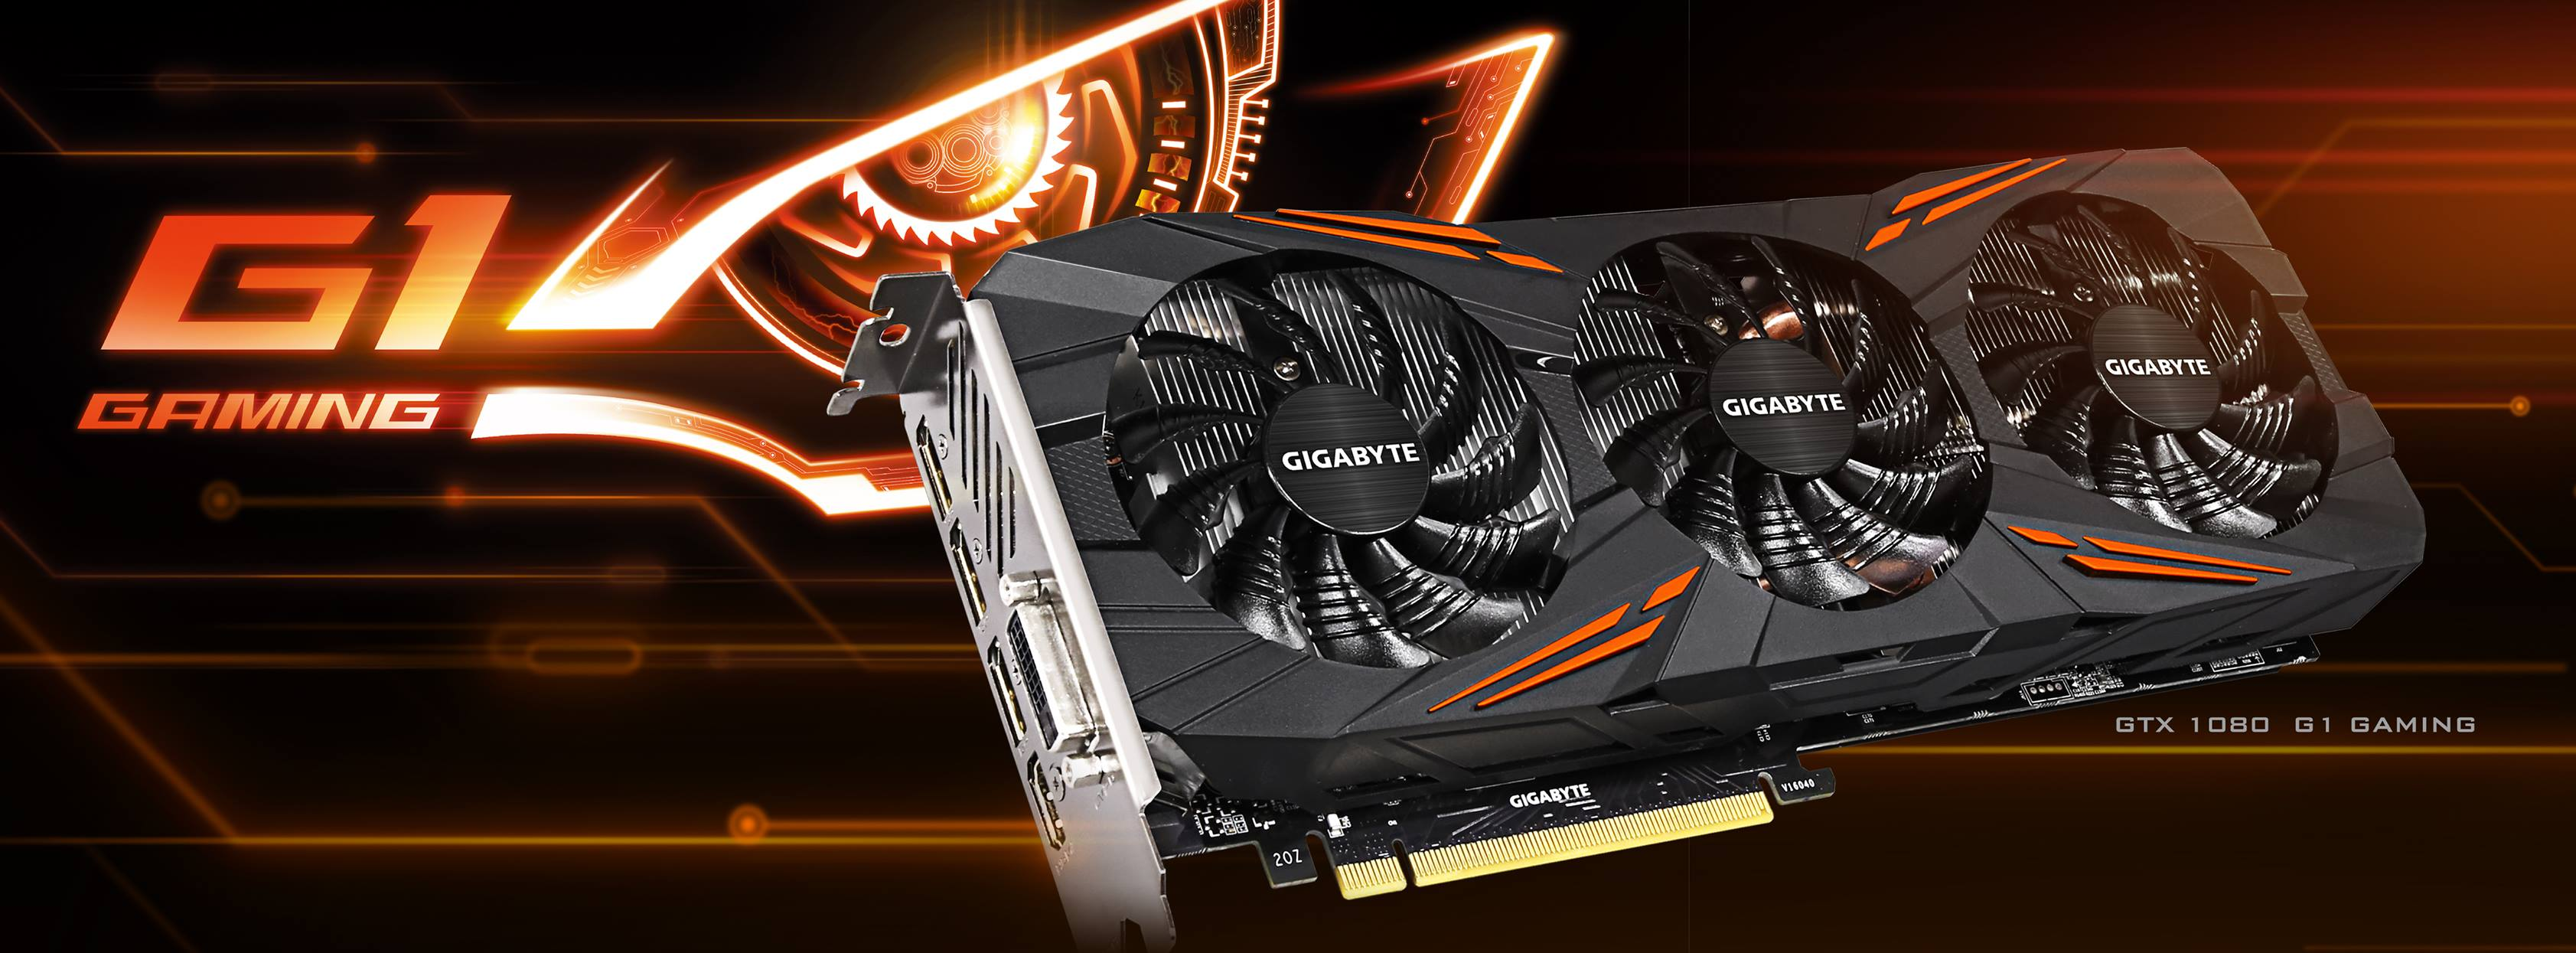 Gigabyte announces GeForce GTX 1080 G1 Gaming   VideoCardz com